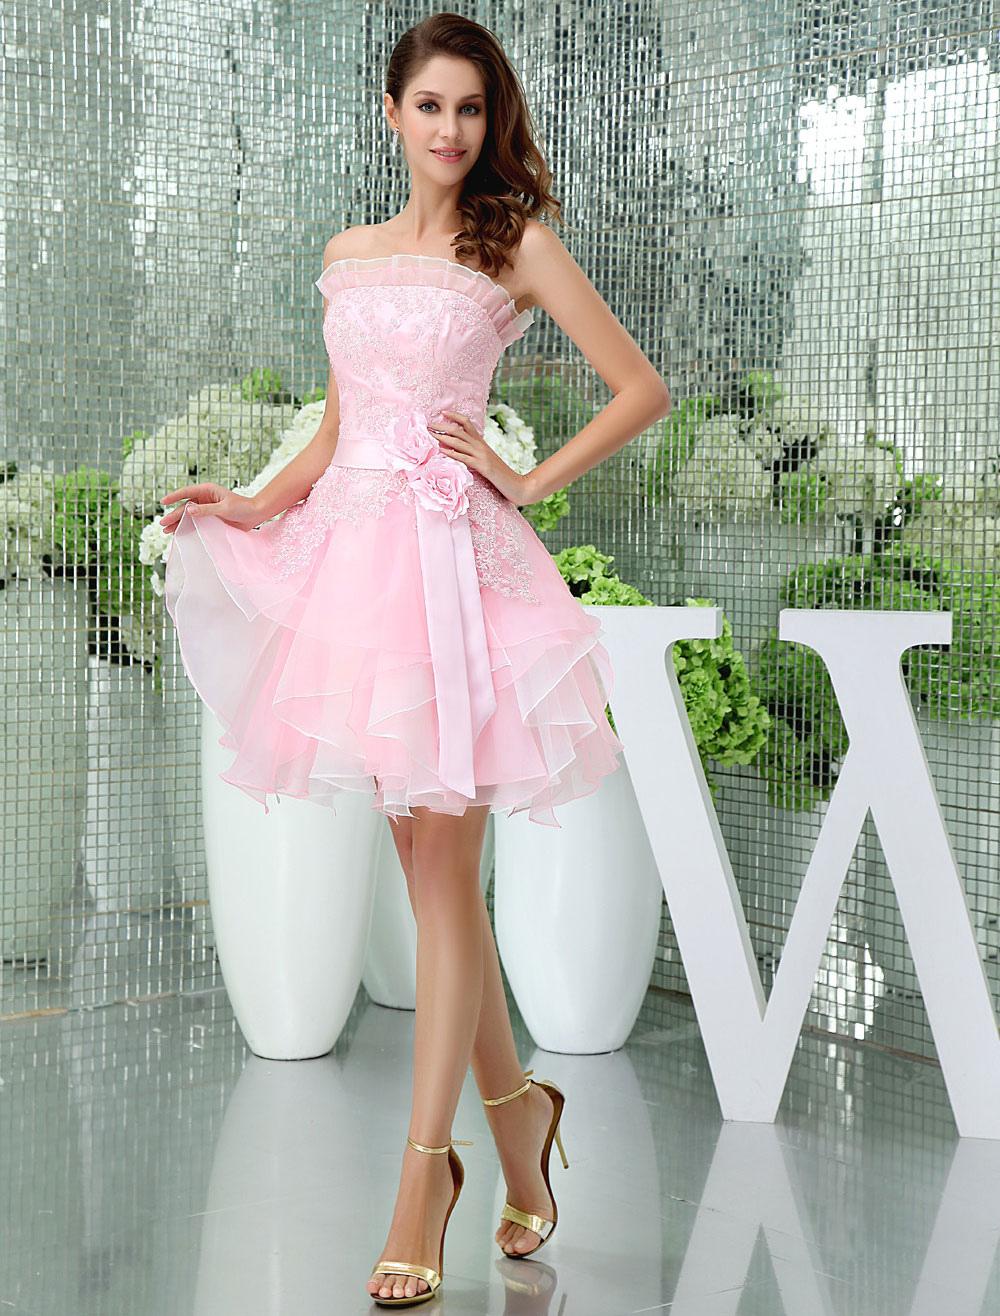 Strapless Homecoming Dress Ruffles Neckline Lace Beading Organza Cocktail Dress Short Prom Dress Milanoo